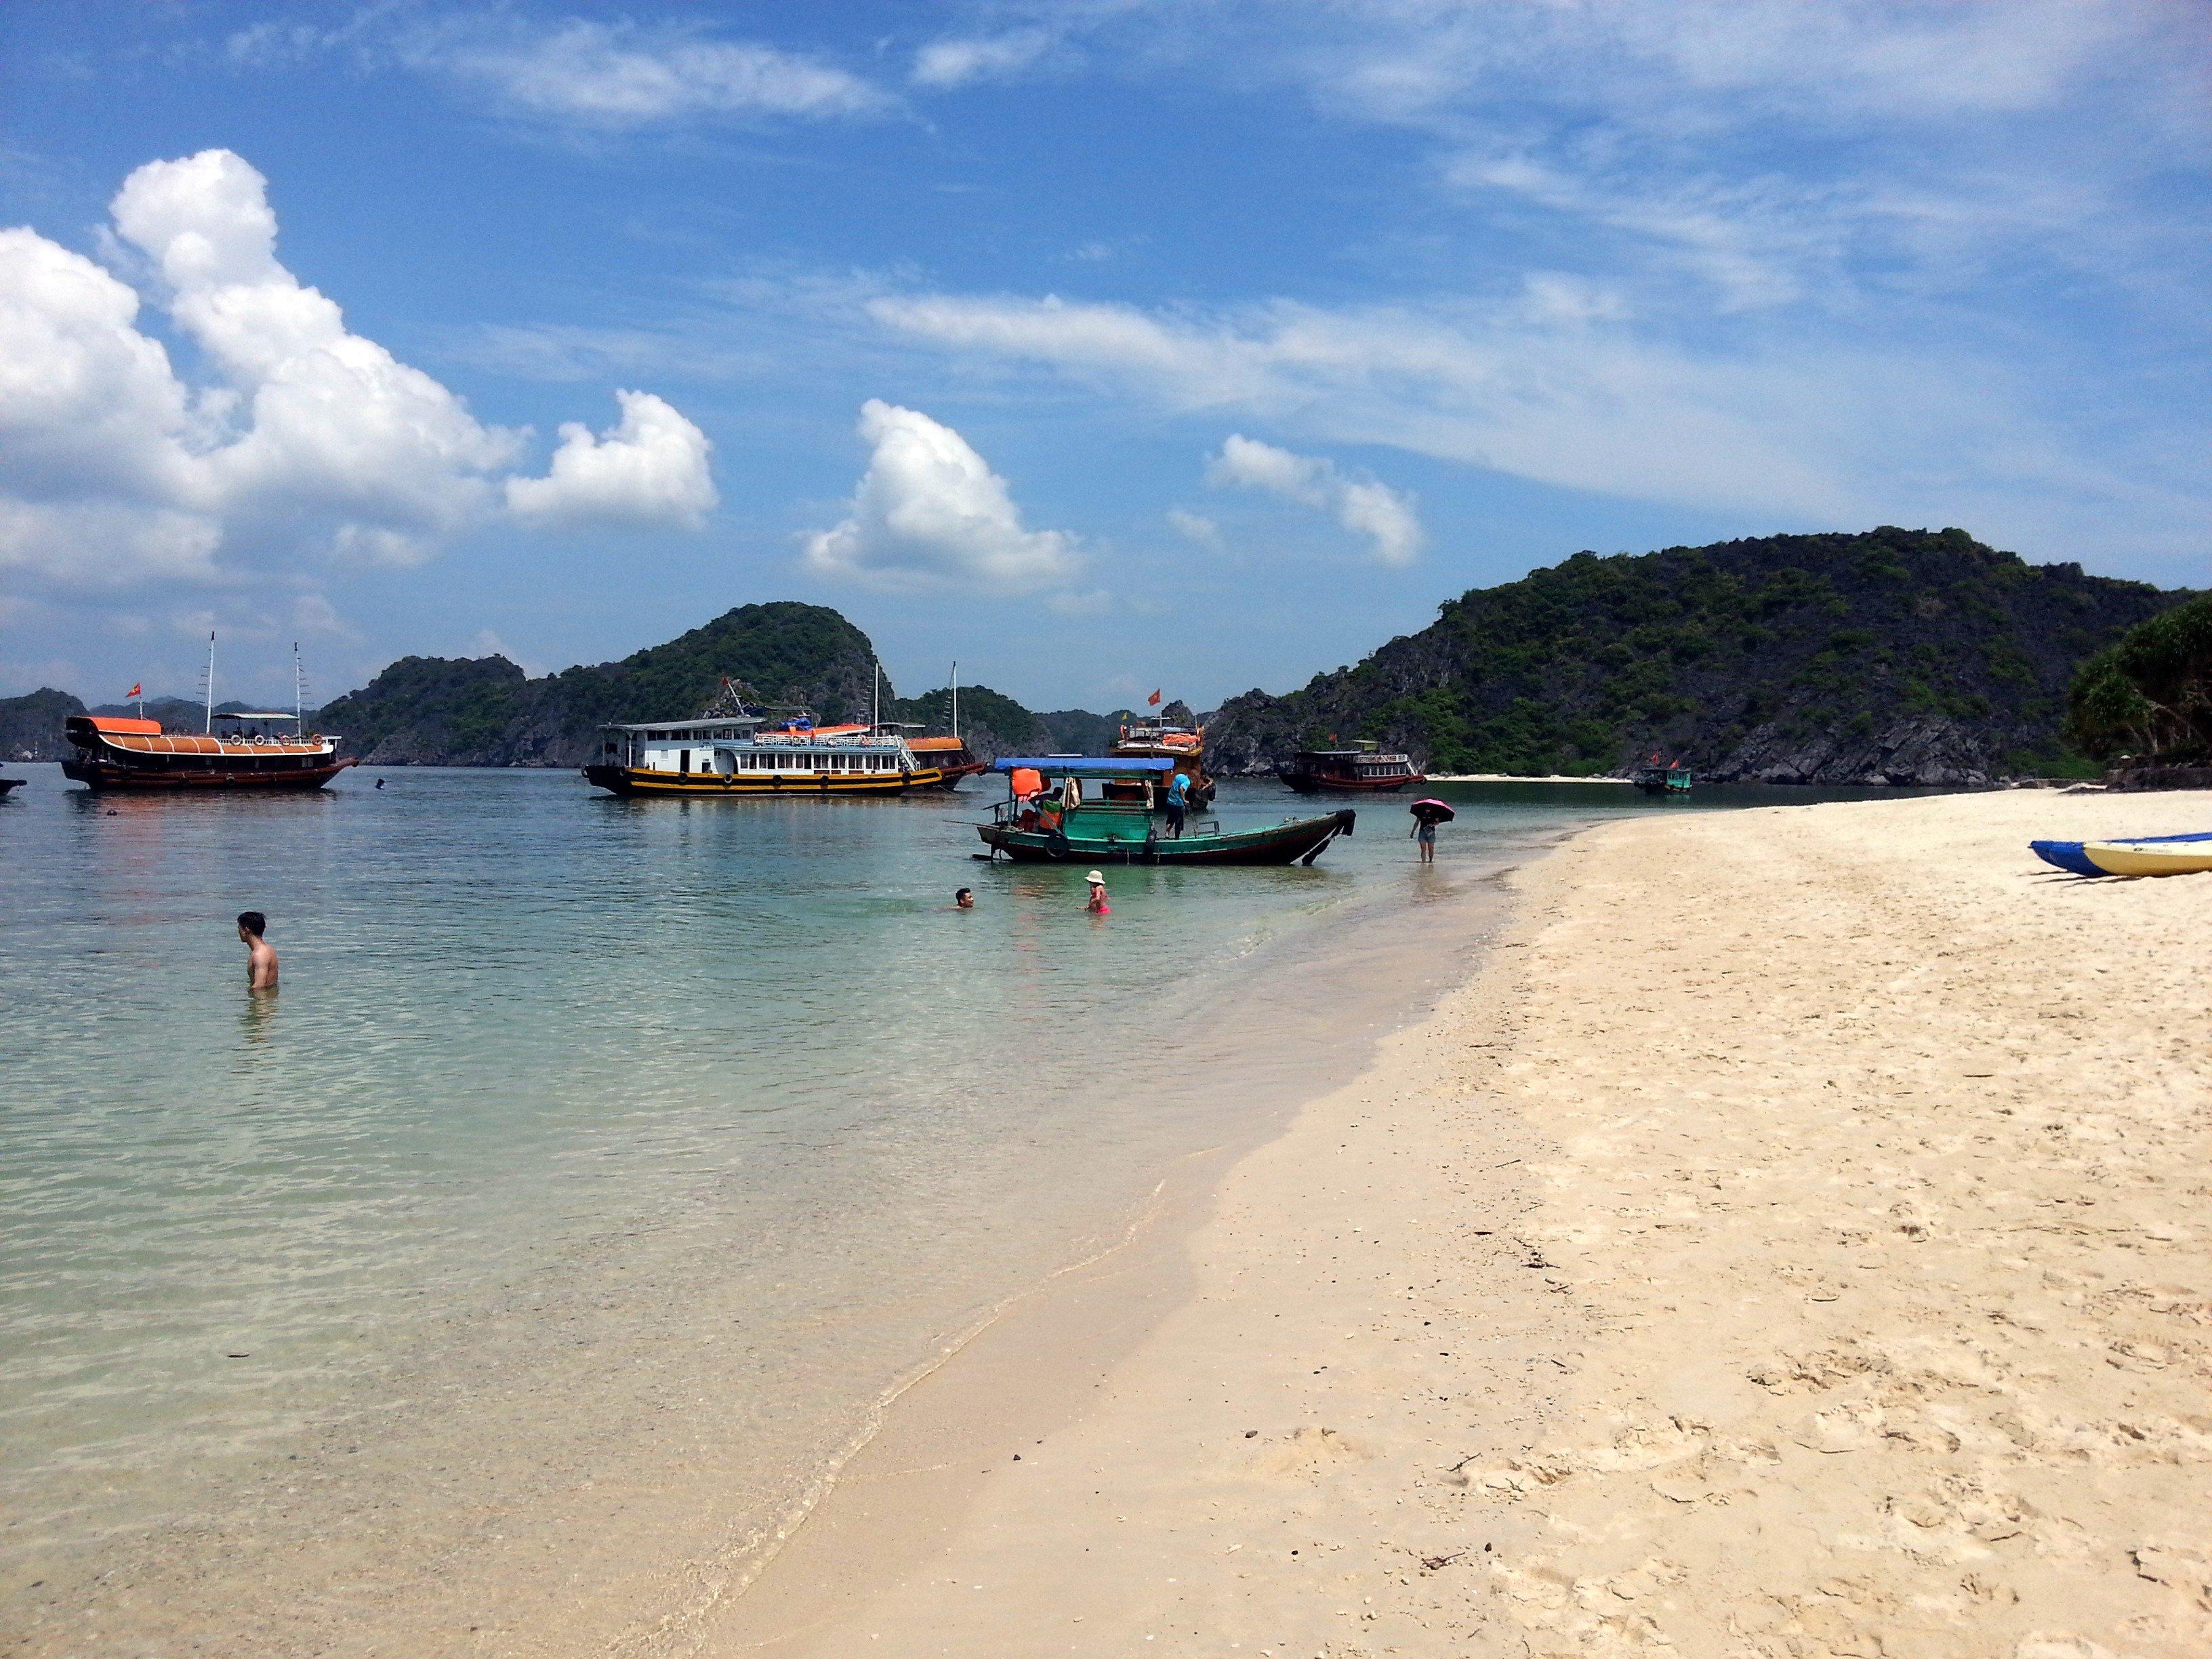 Beach on Monkey Island